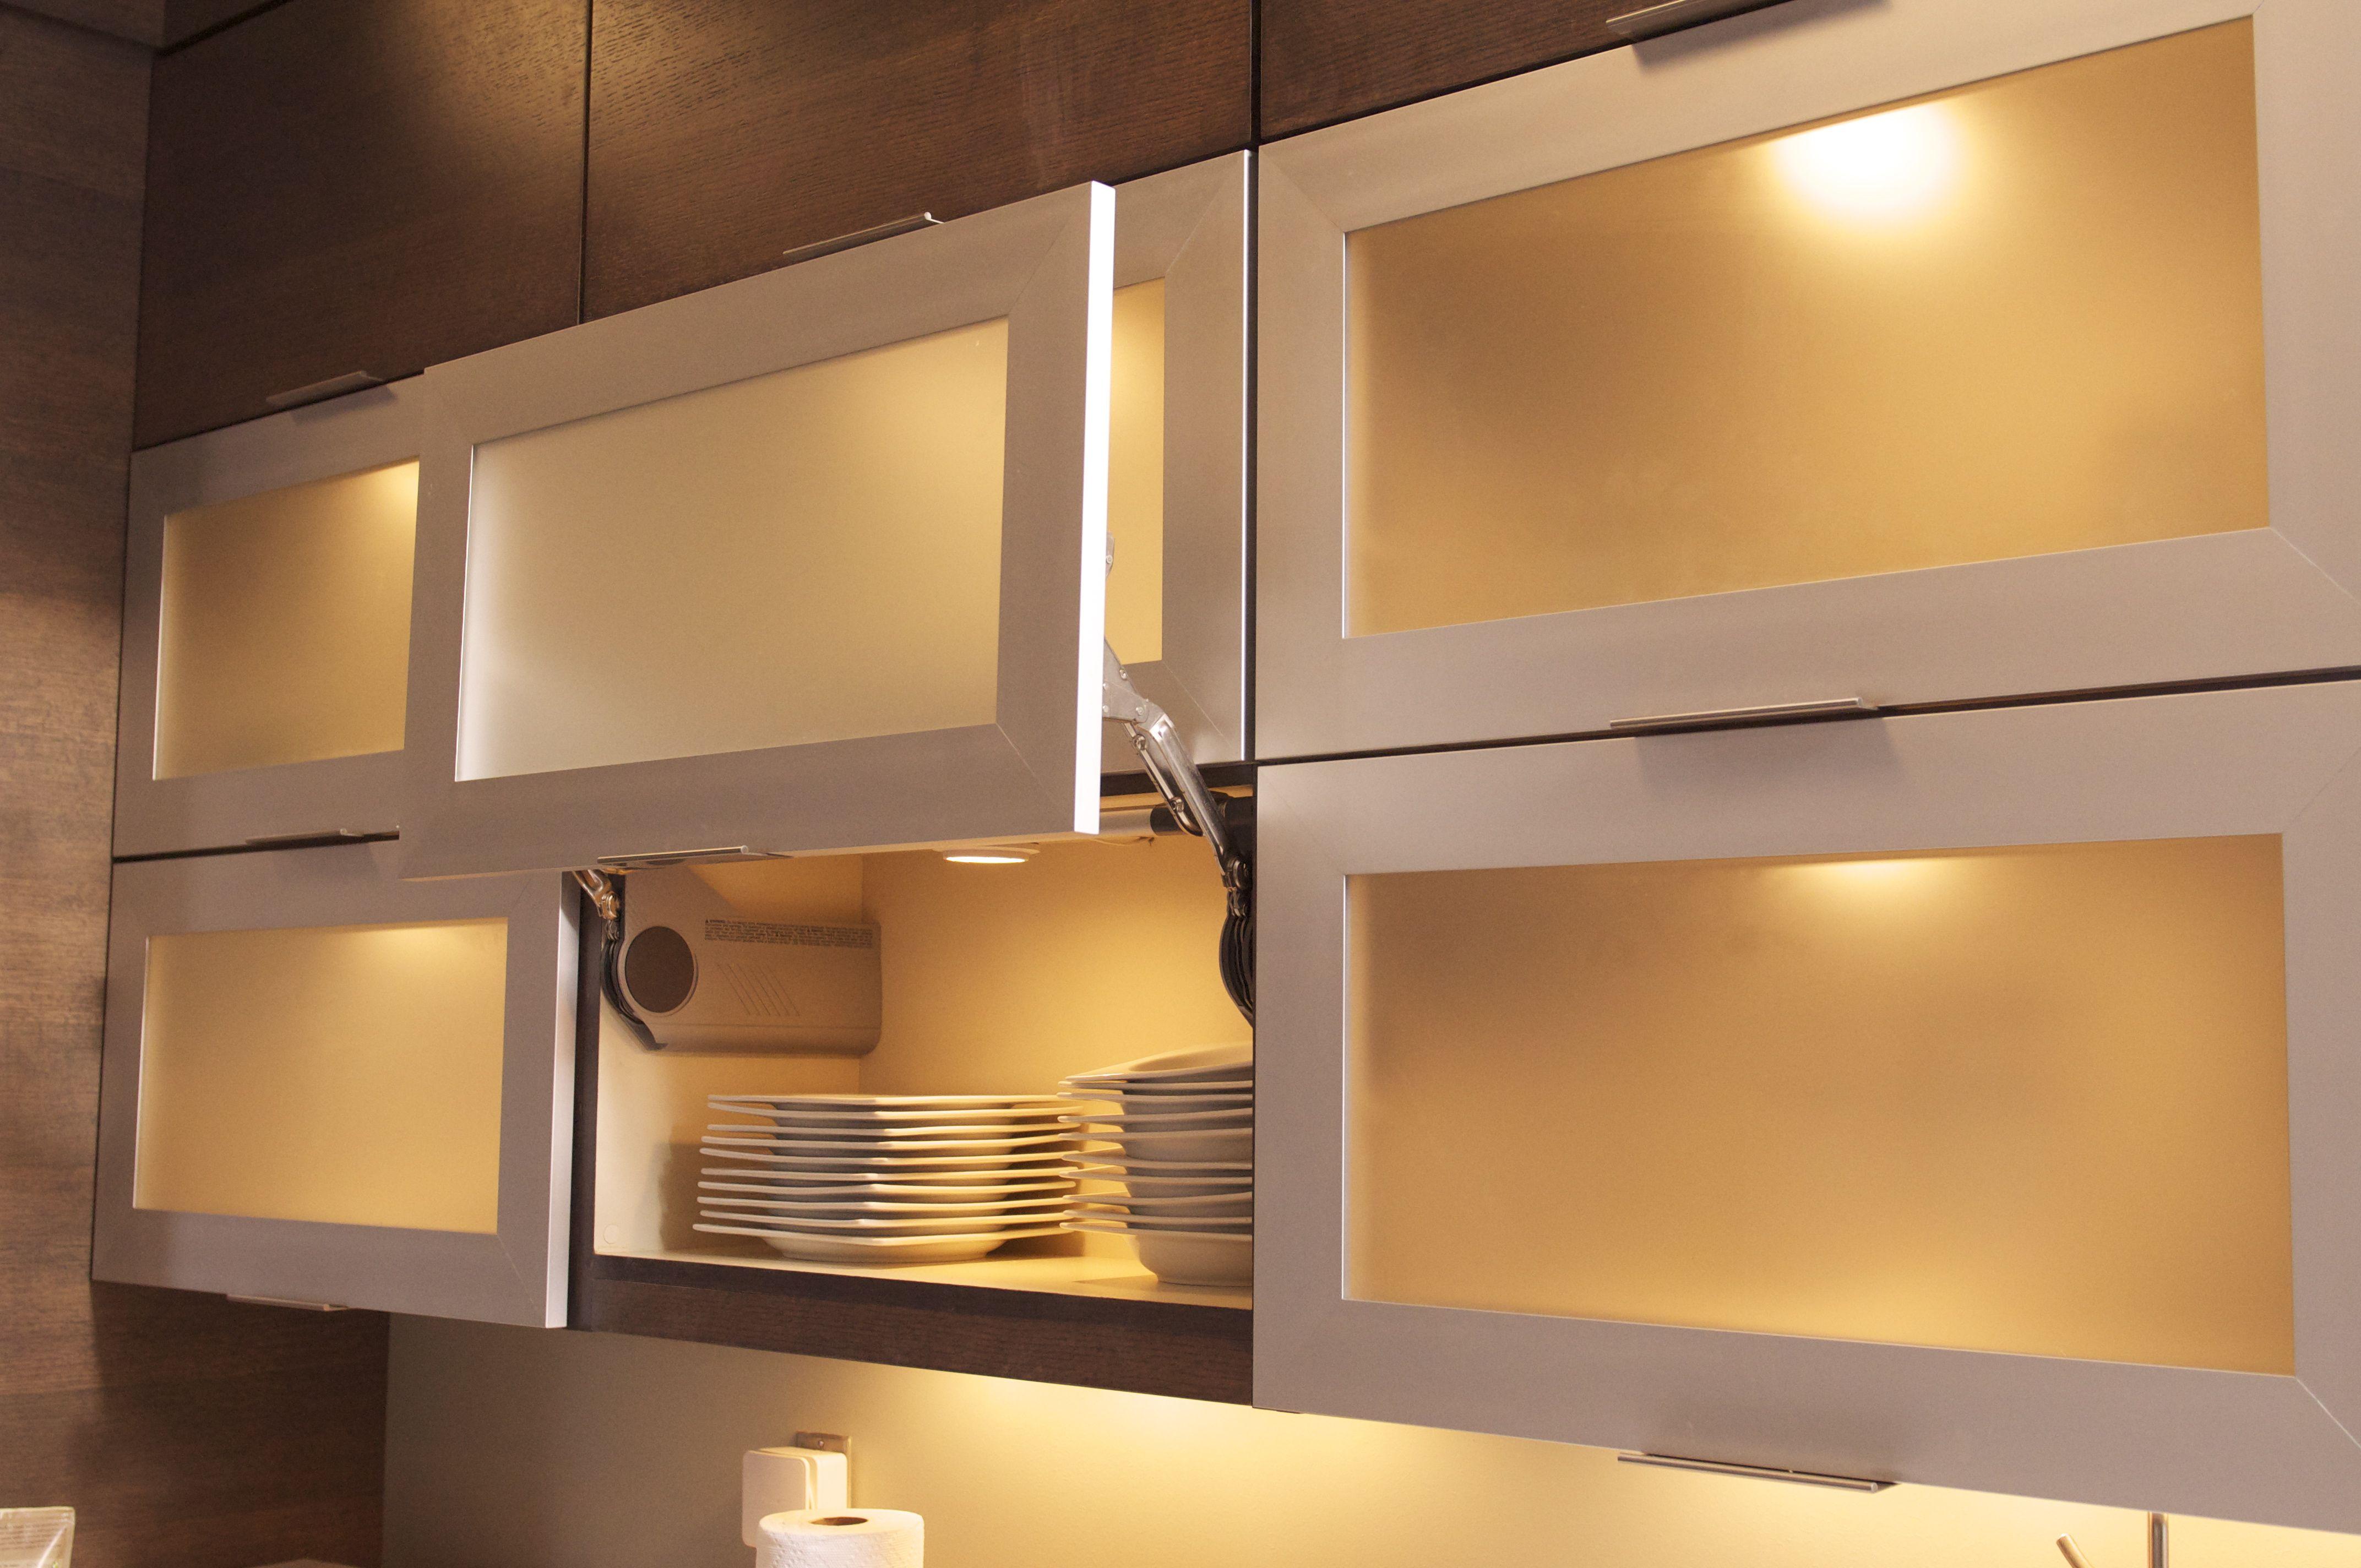 Aluminum cabinet doors with Blum Aventos HL Hinges which